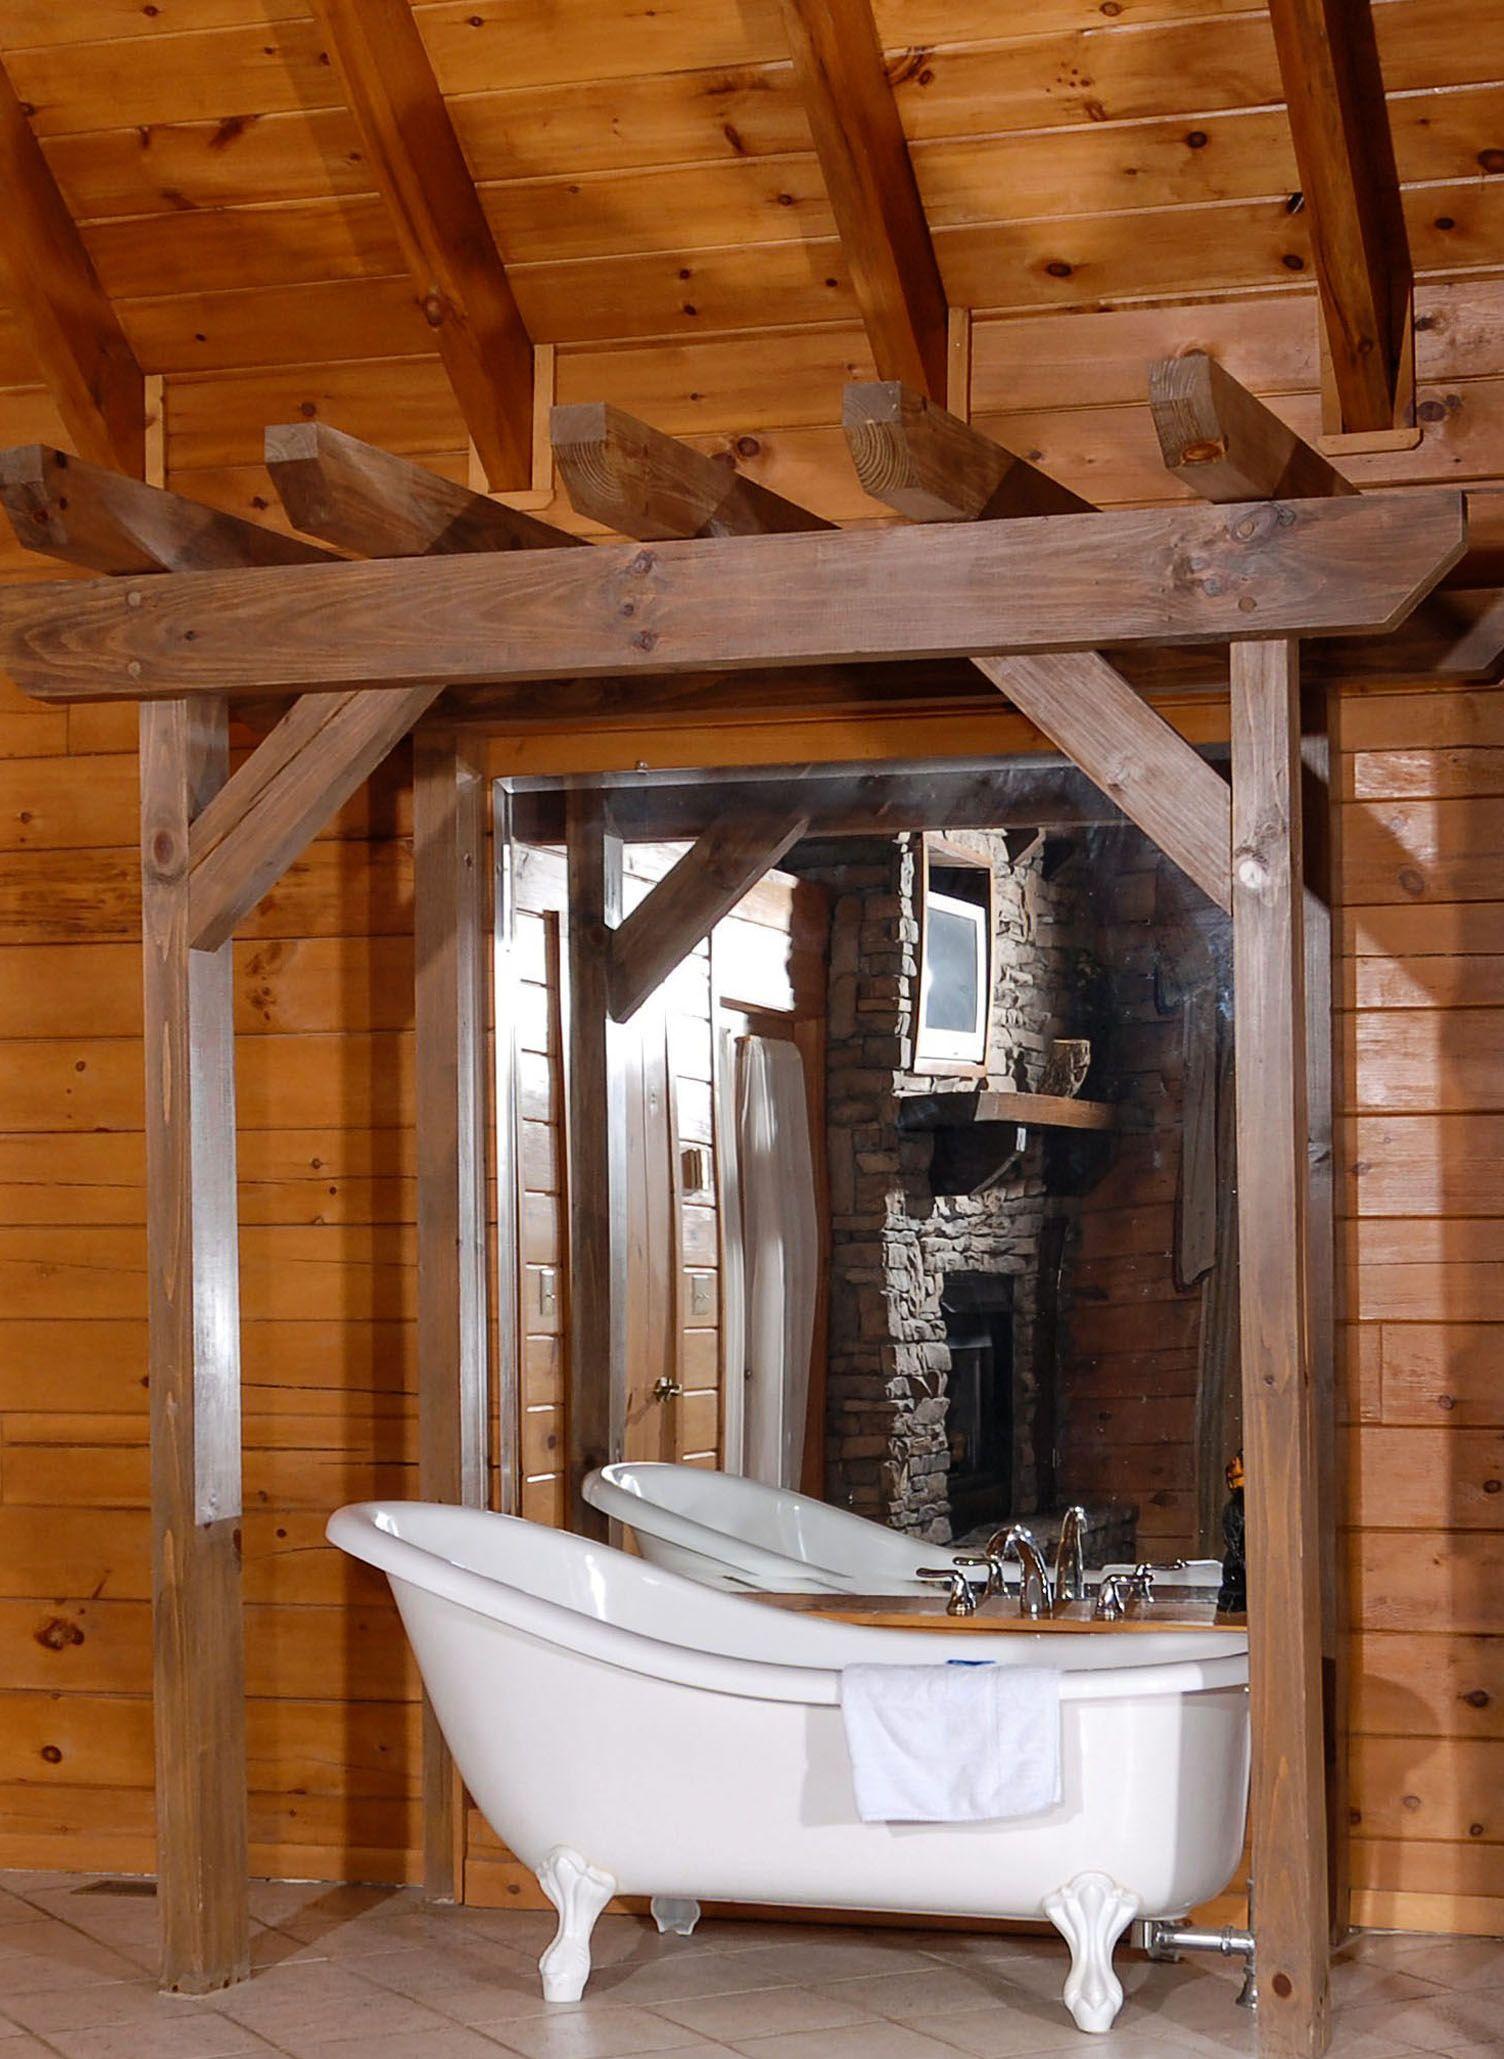 lodging unique in outdoor walland interior gatlinburg tennessee cabins usa spcecraftfilms of luxury townsend